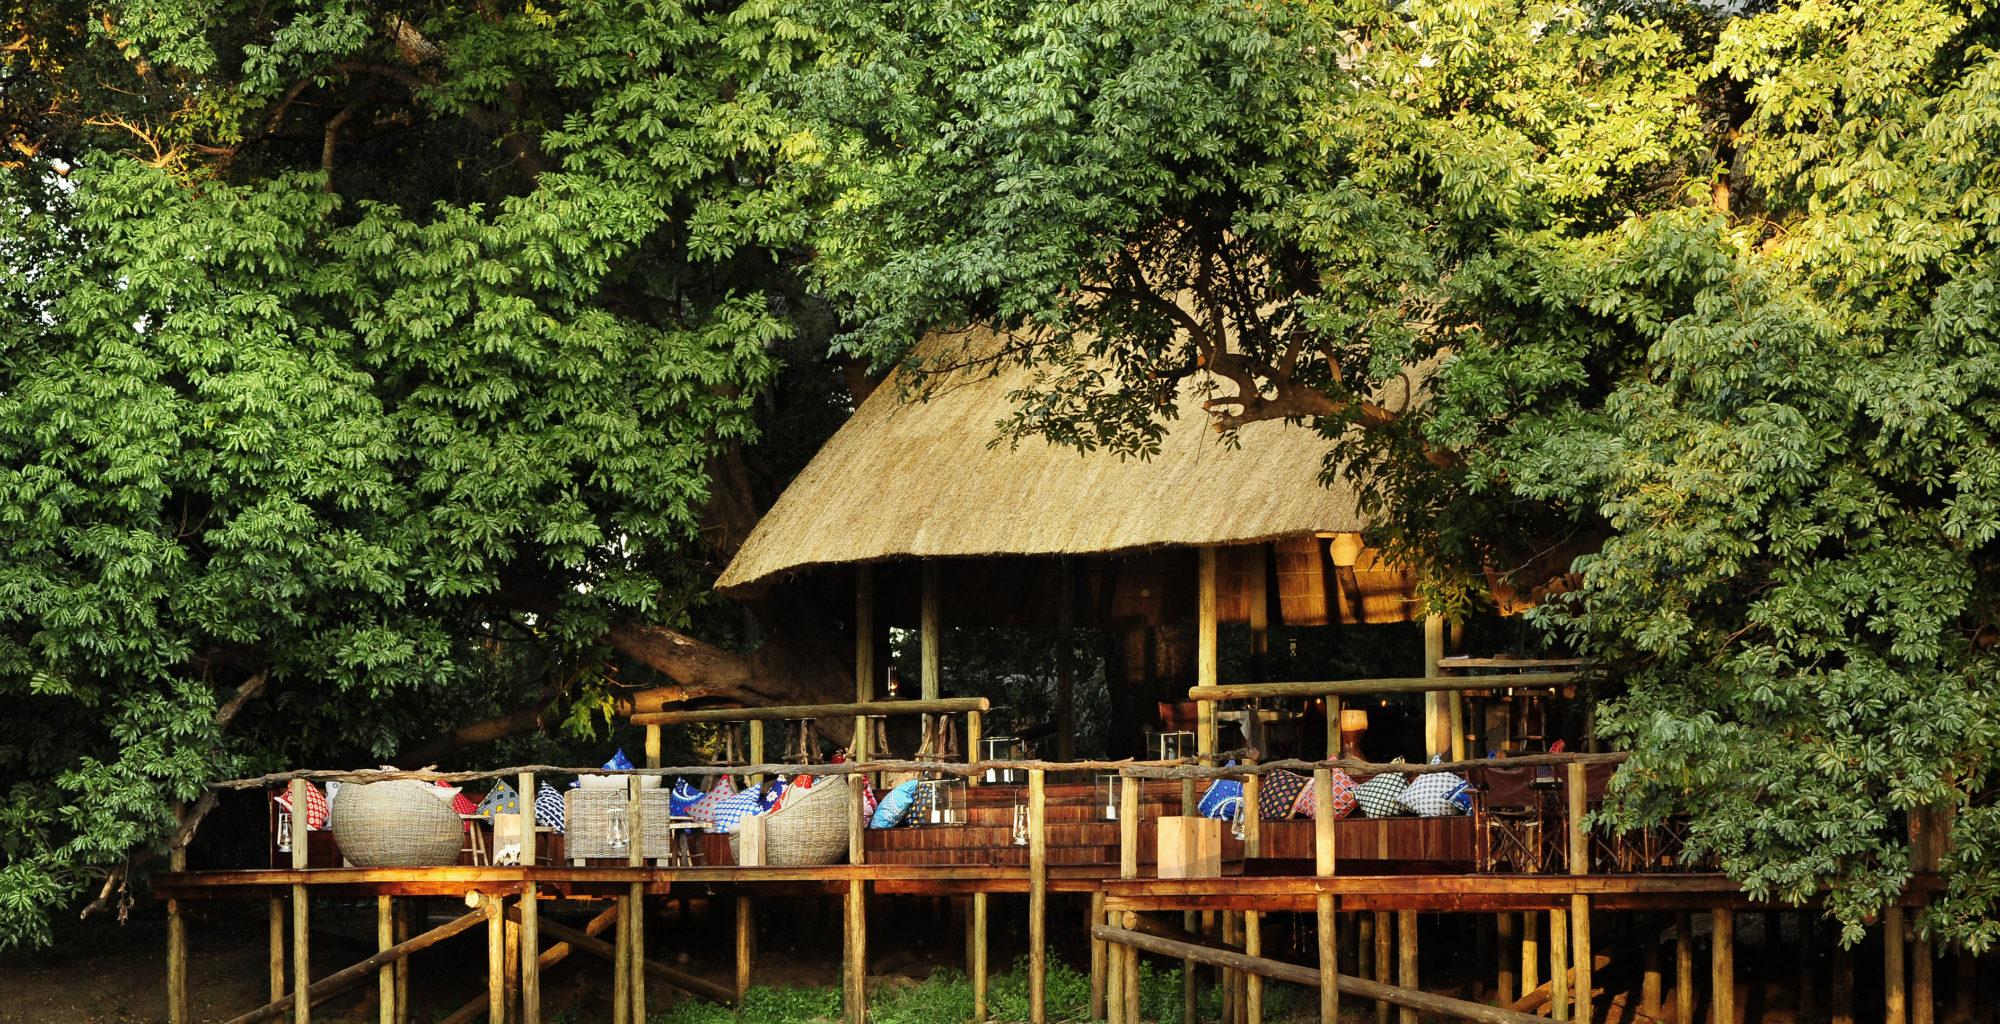 Zambia-Bilimungwe-Bushcamp-Exterior